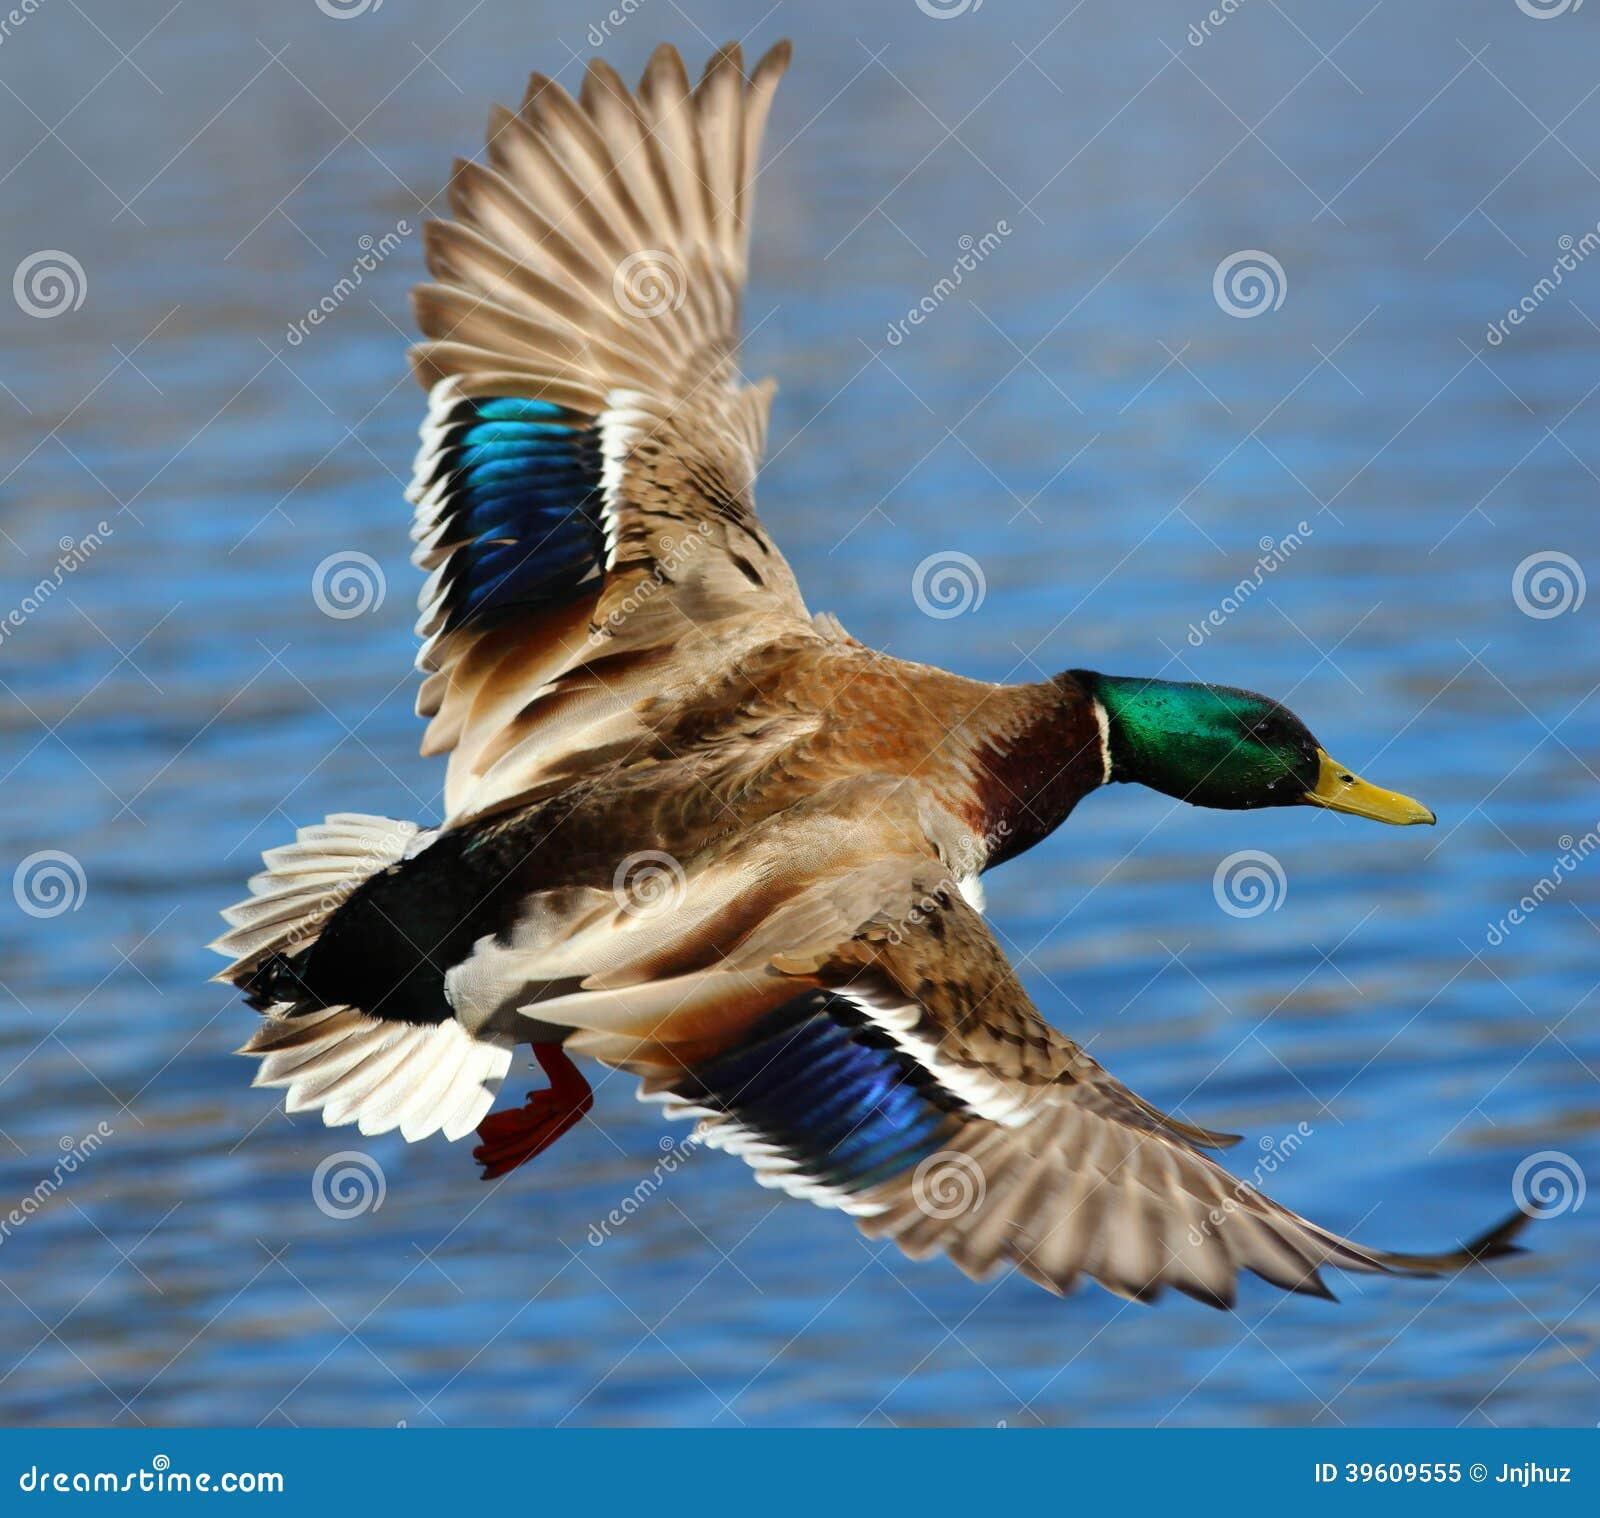 male mallard duck flying over water stock photo image 39609555